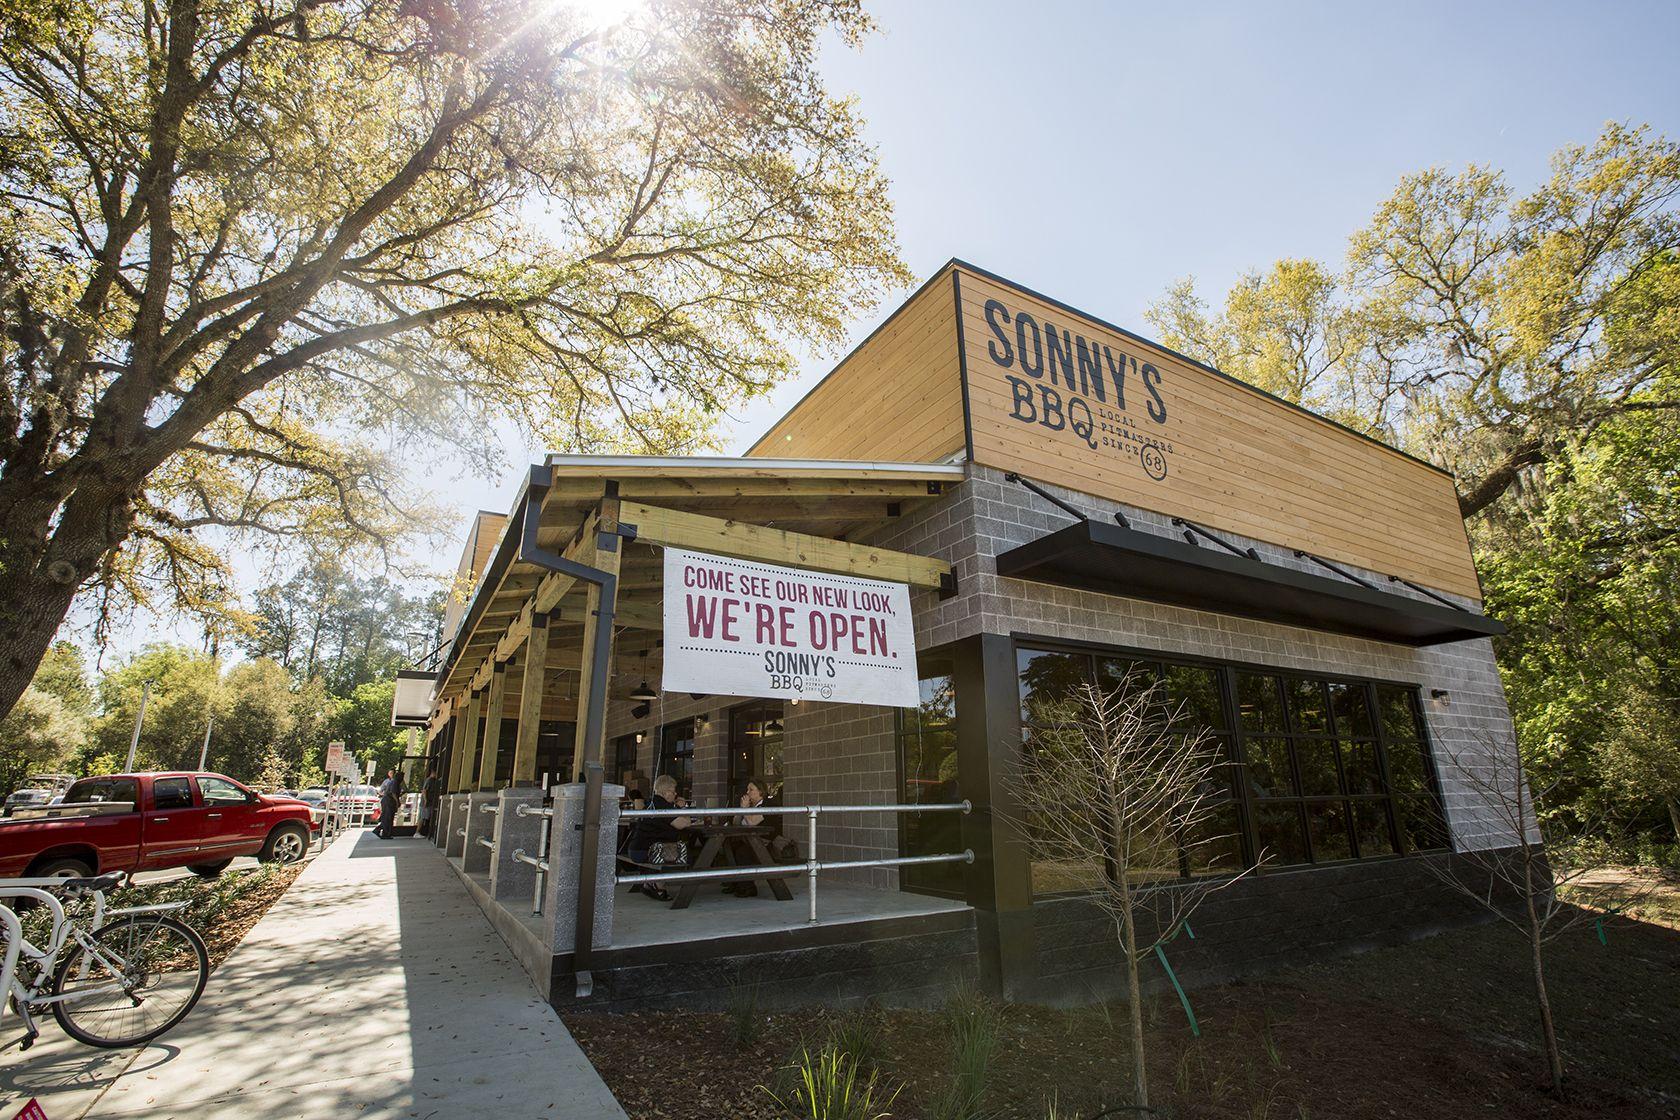 Sonny S Bbq Sonnys Bbq Bbq Barbecue Restaurant